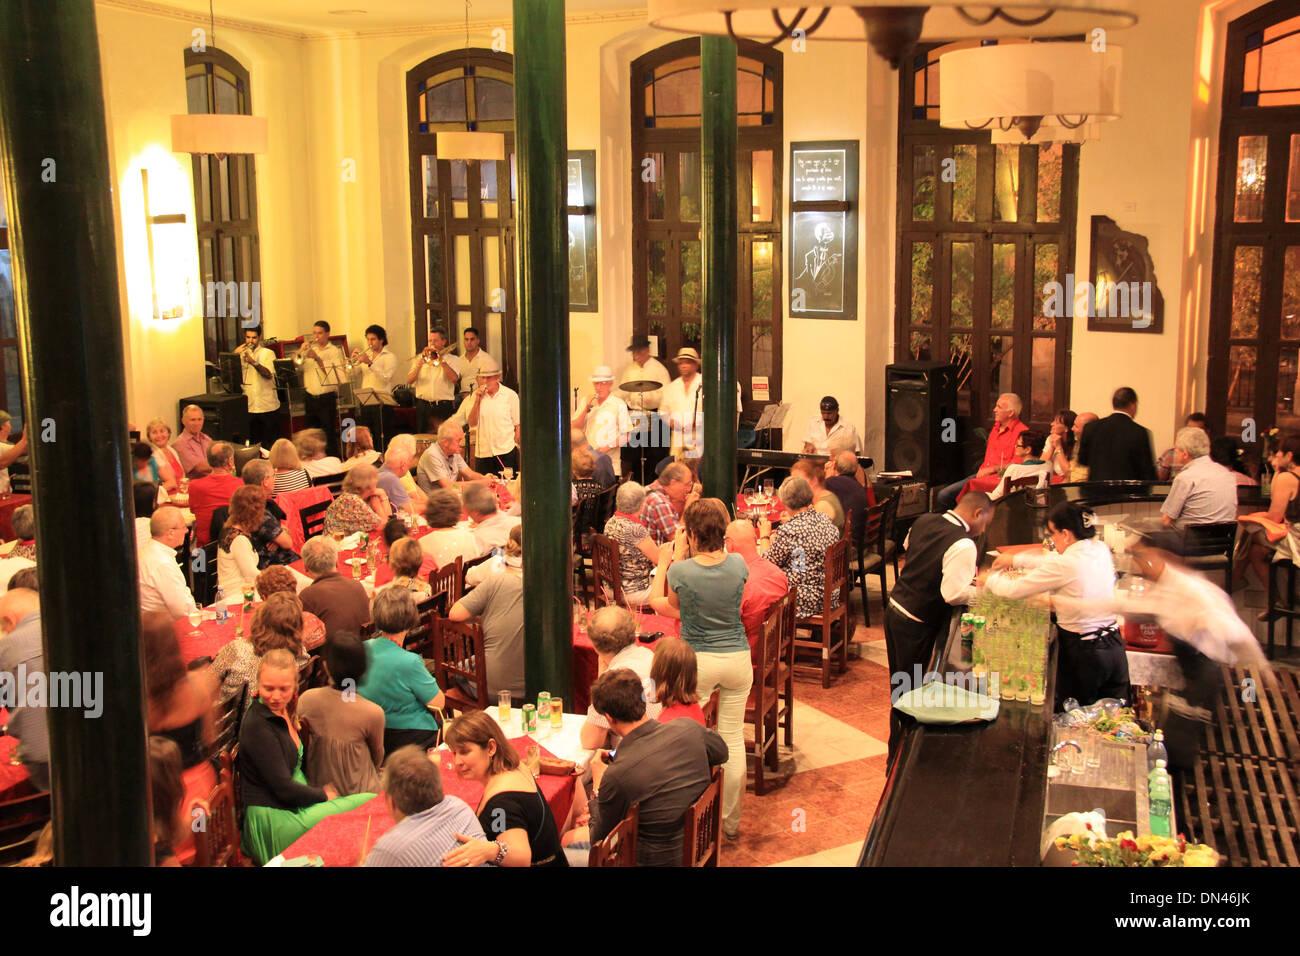 Buena Vista Social Club at Café Taberna, Old Havana (La Habana Vieja), Cuba, Caribbean Sea, Central America - Stock Image